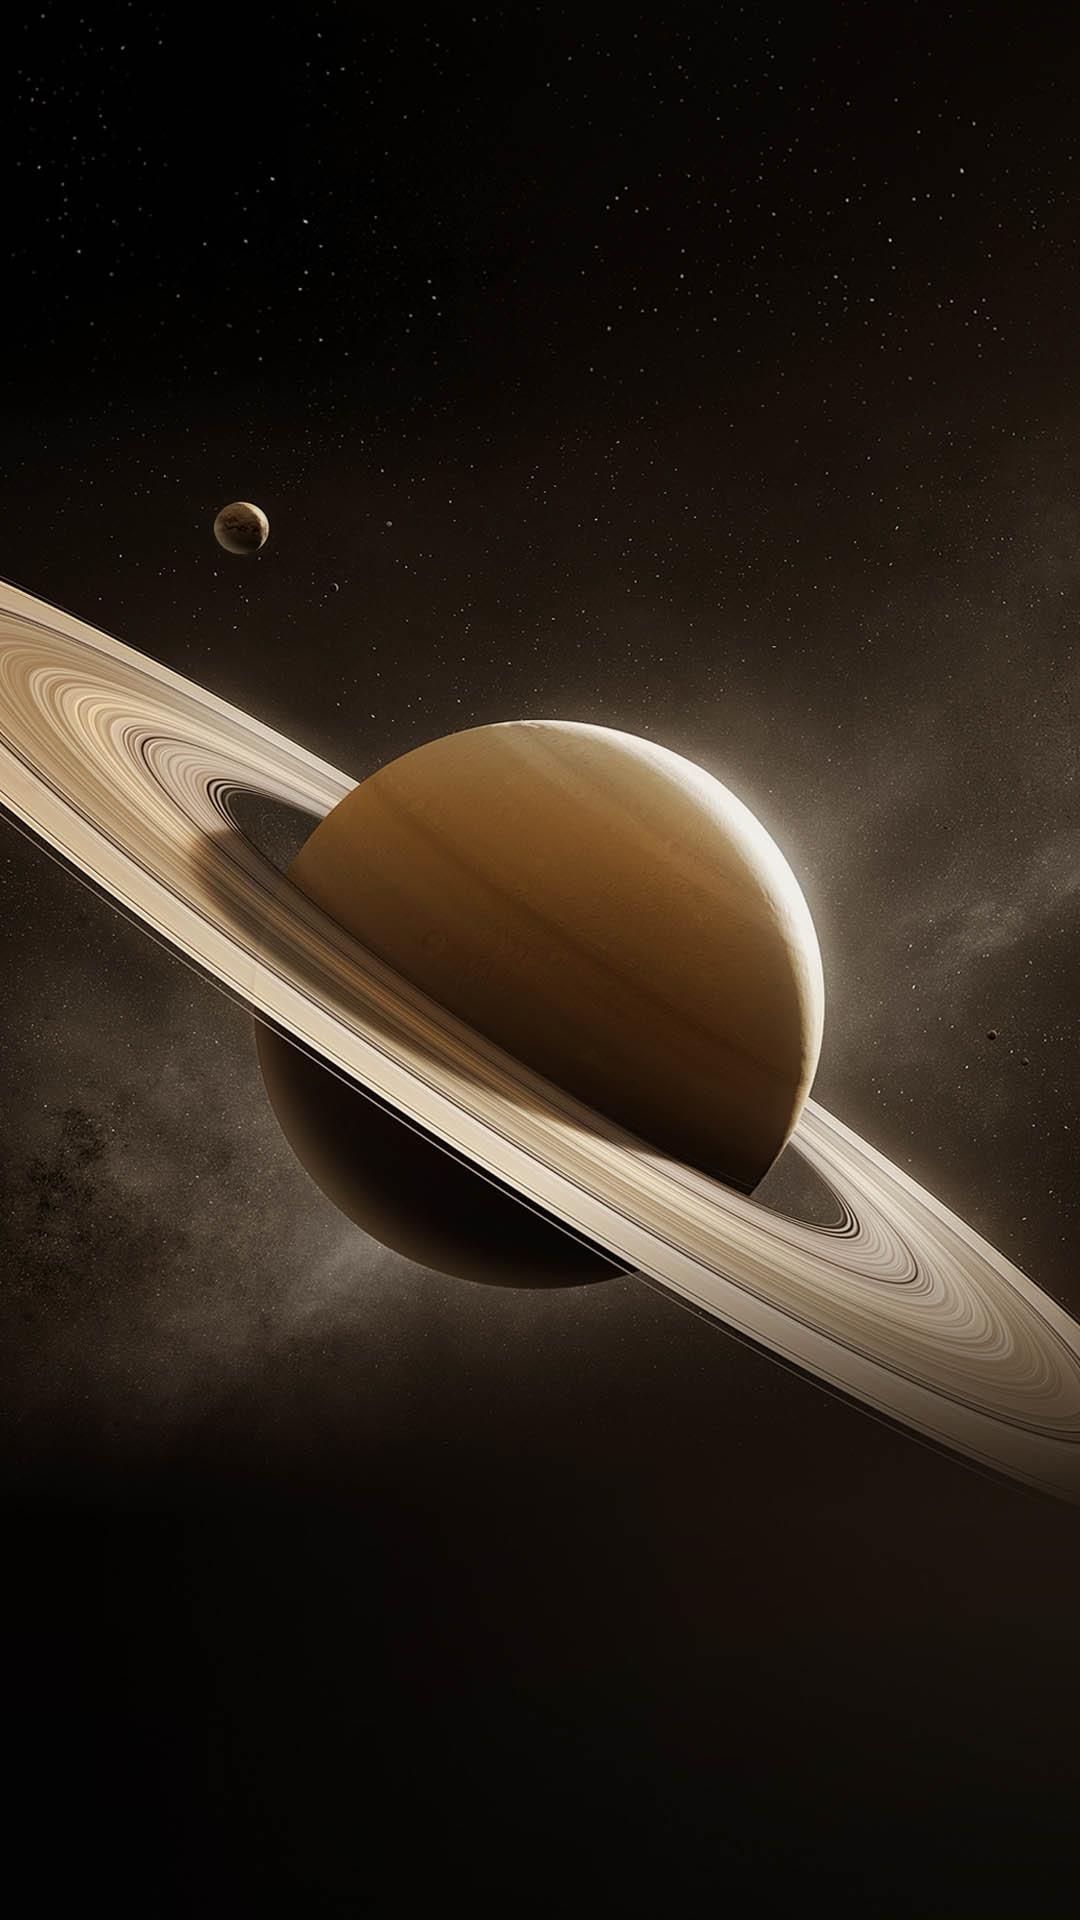 Saturn iphone 6s plus wallpaper